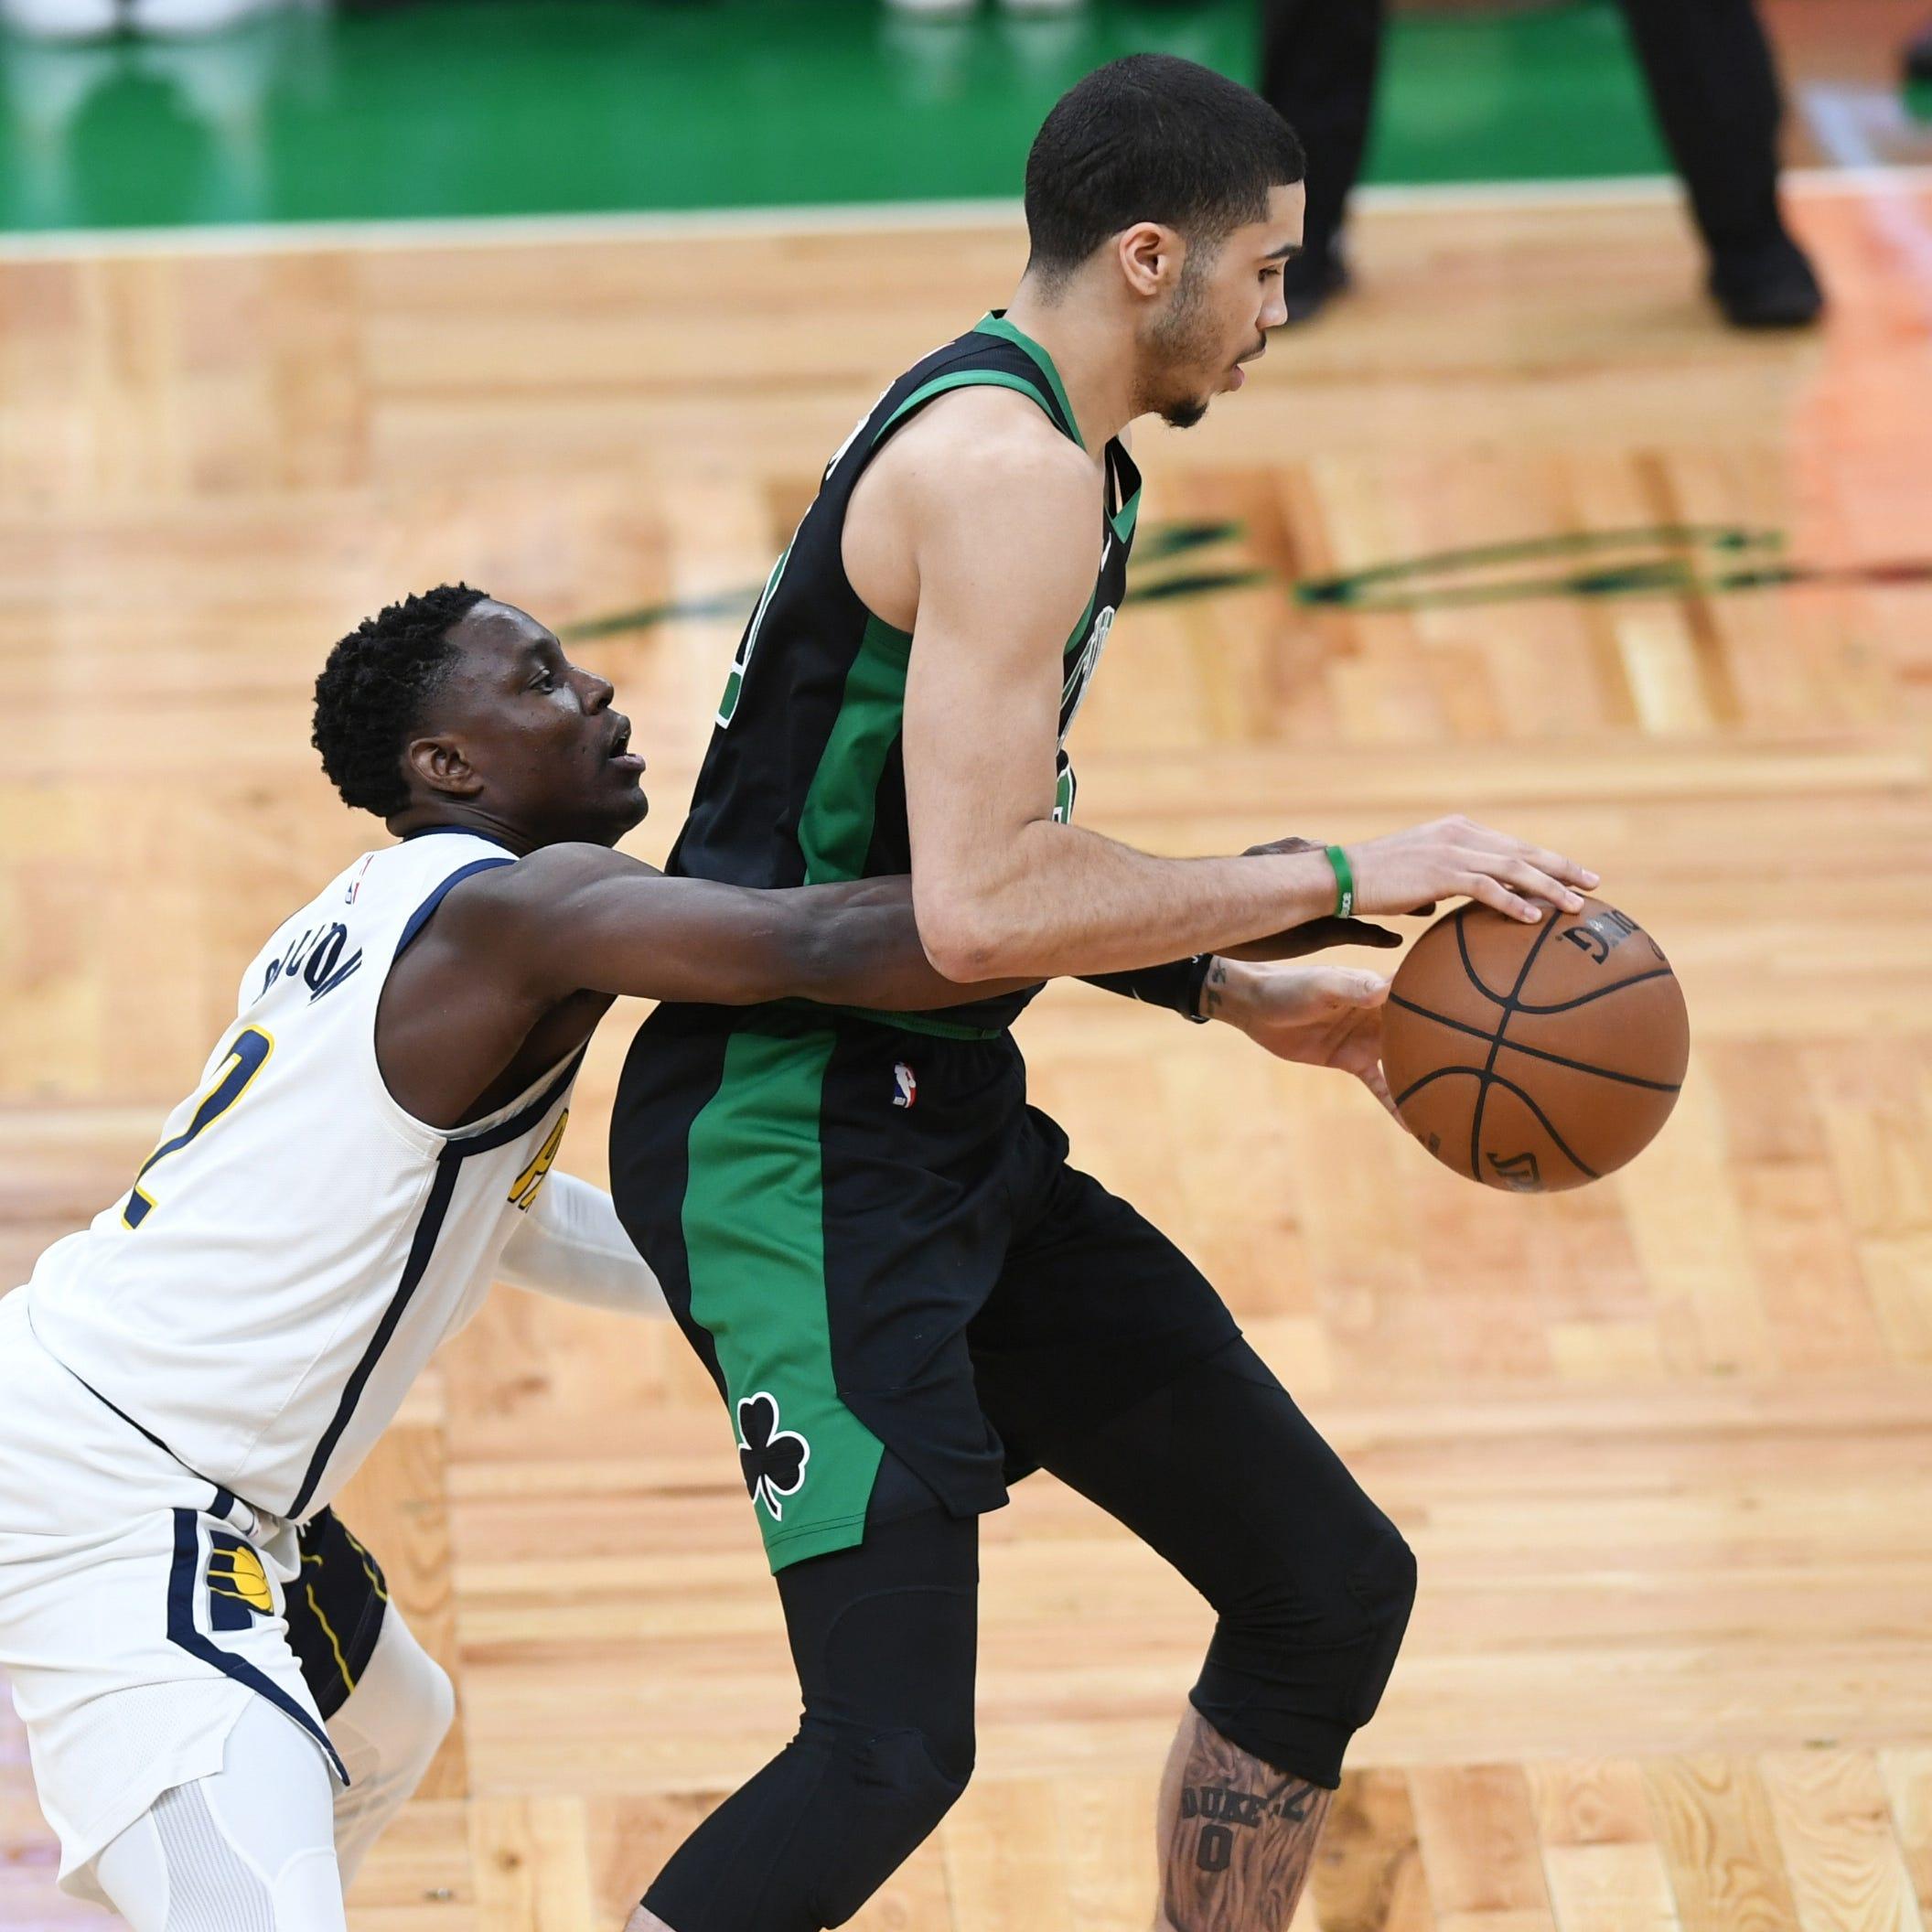 Doyel: Pacers PG Darren Collison sees slump endingin Game 2 vs. Celtics